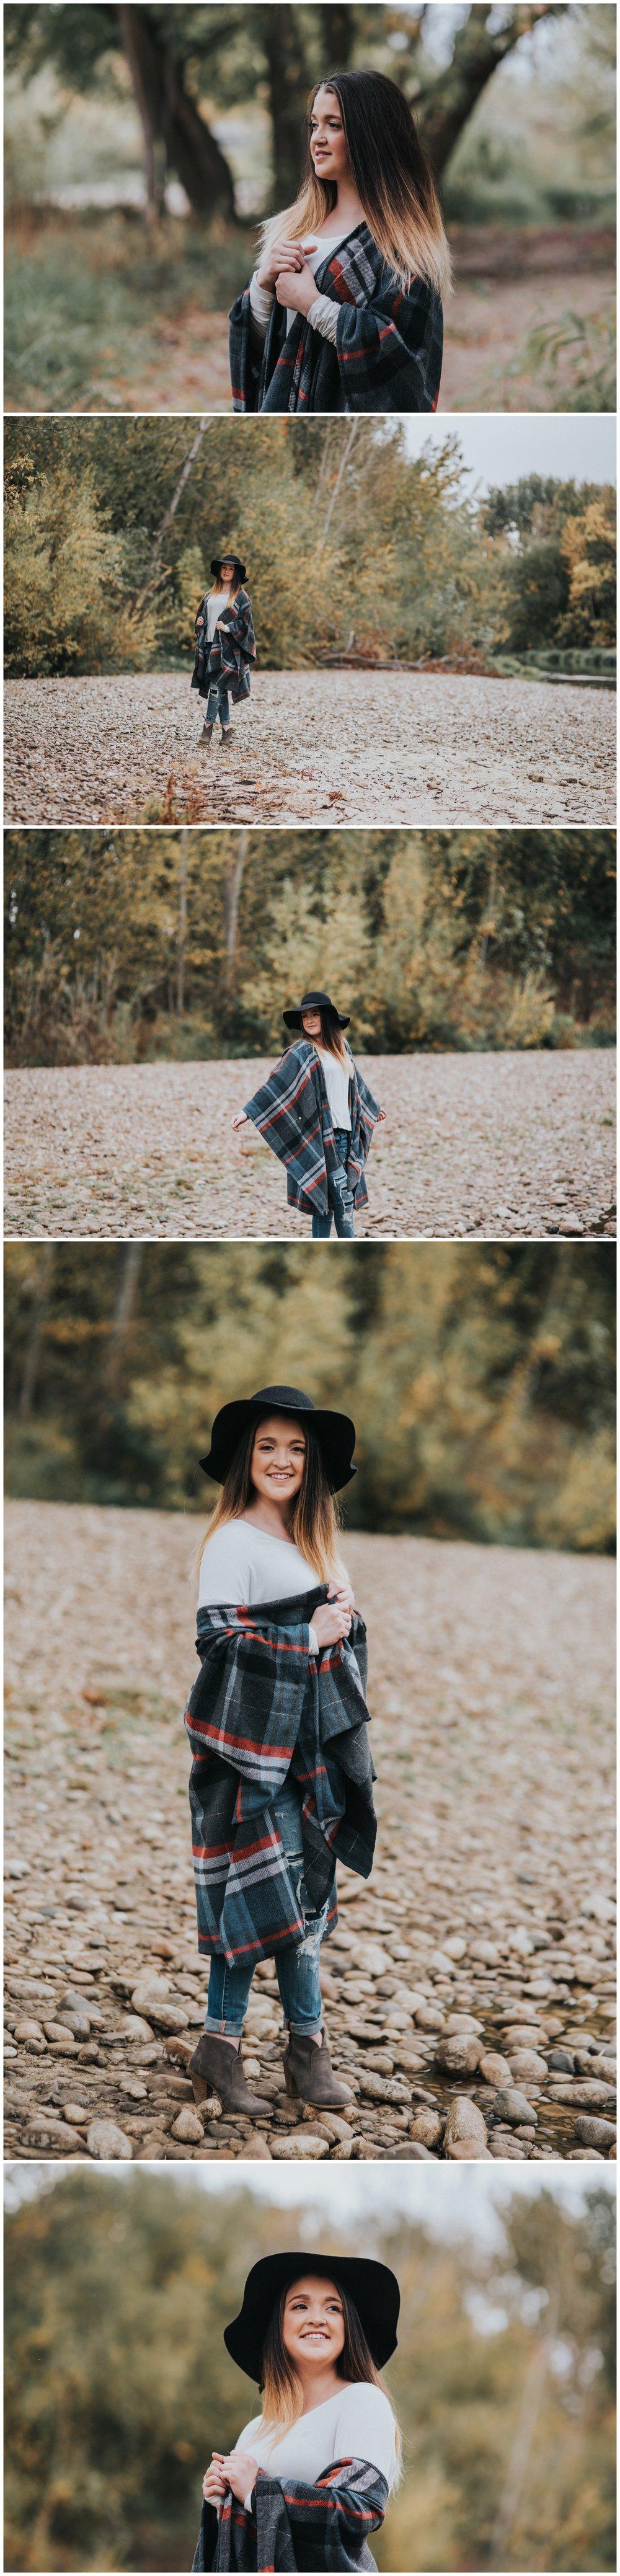 Boise Senior Photographer Makayla Madden Photography Fall Senior Pictures Senior Girl Fall Senior Photos Outfit Ideas Inspiration Fall Vibes Fall Portraits Idaho Hair Flips Fun Senior Pics